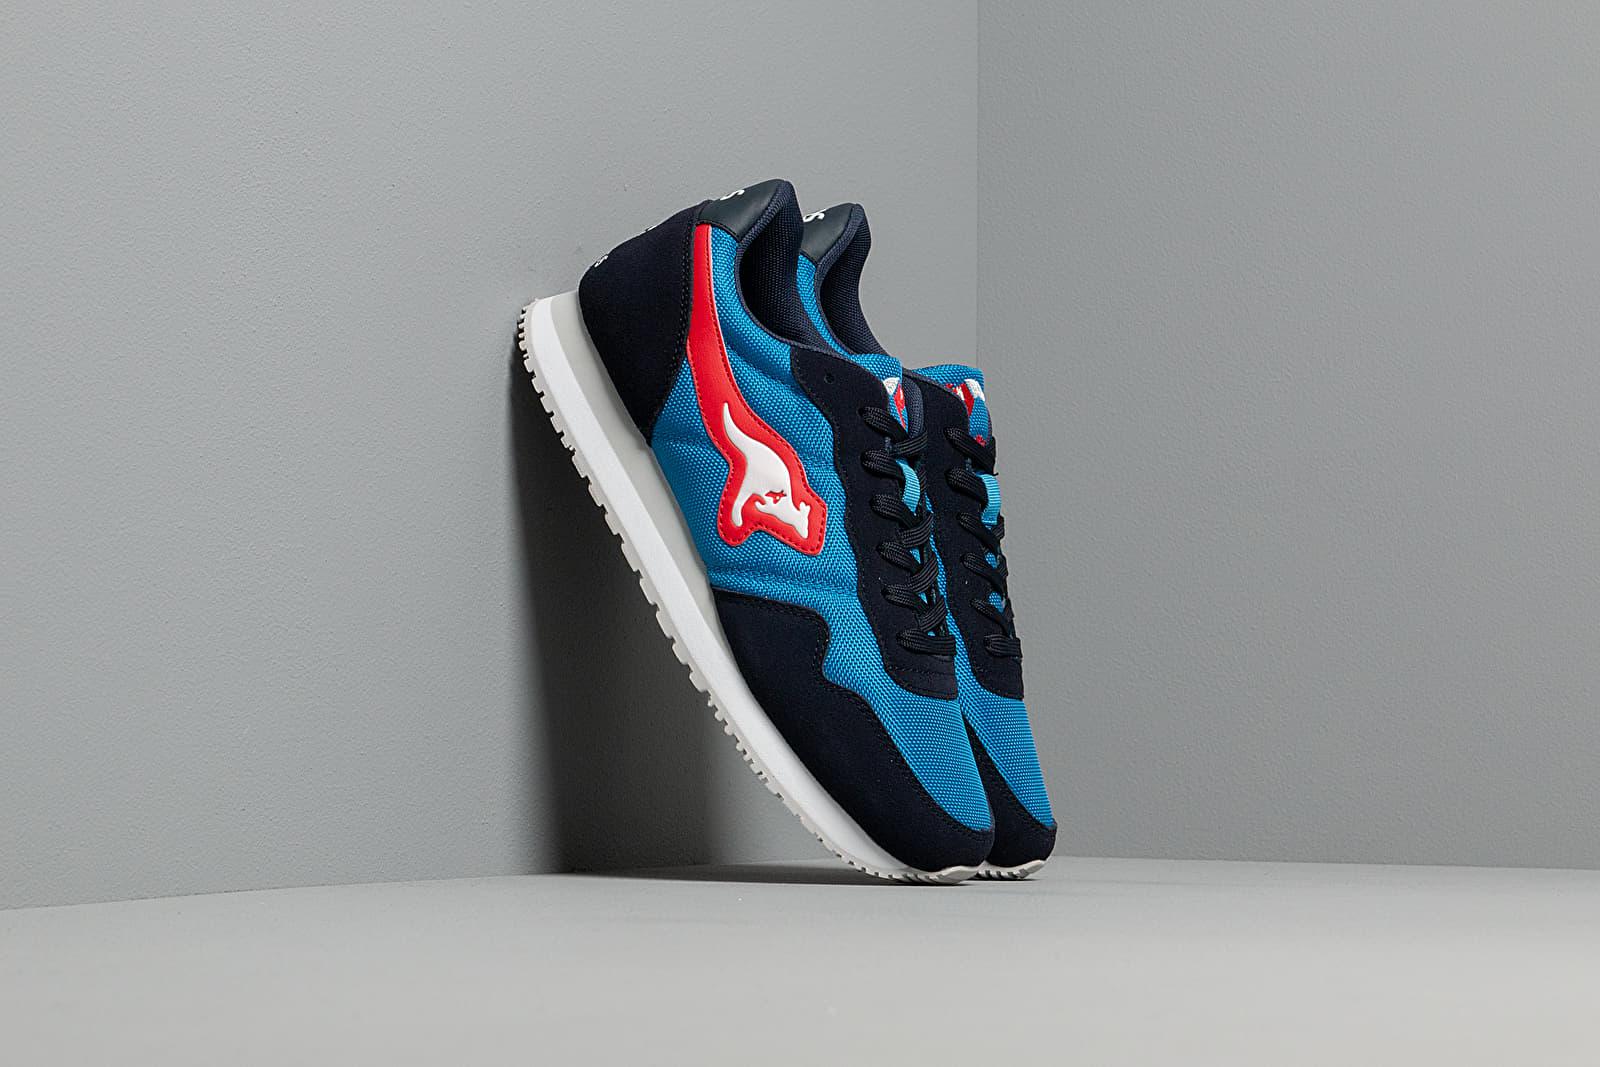 Pánské tenisky a boty KangaROOS INVADER 40 Brillant Blue